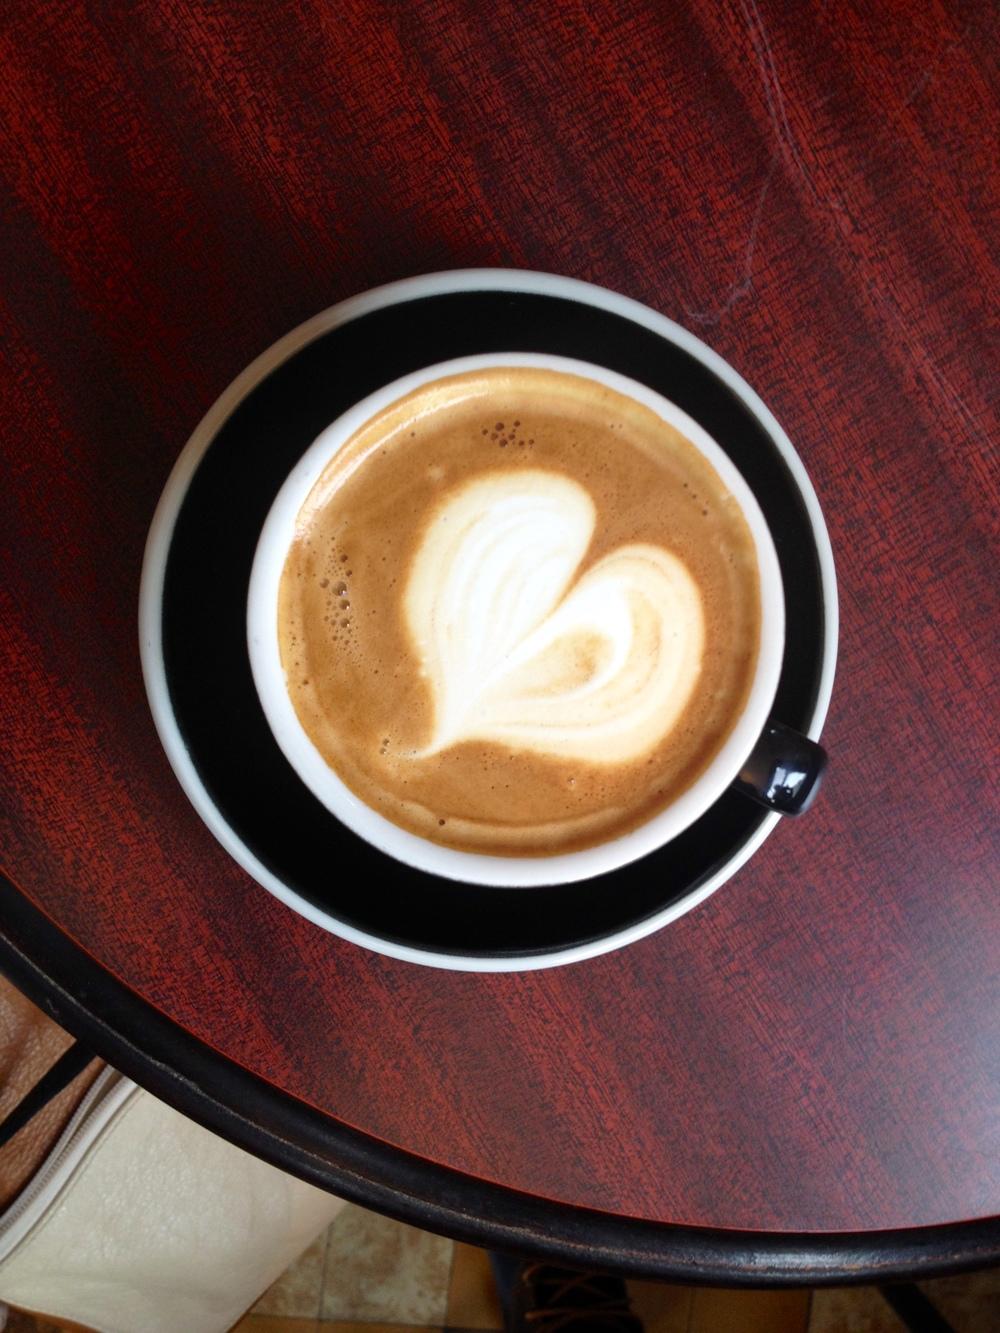 The requisite latte shot.